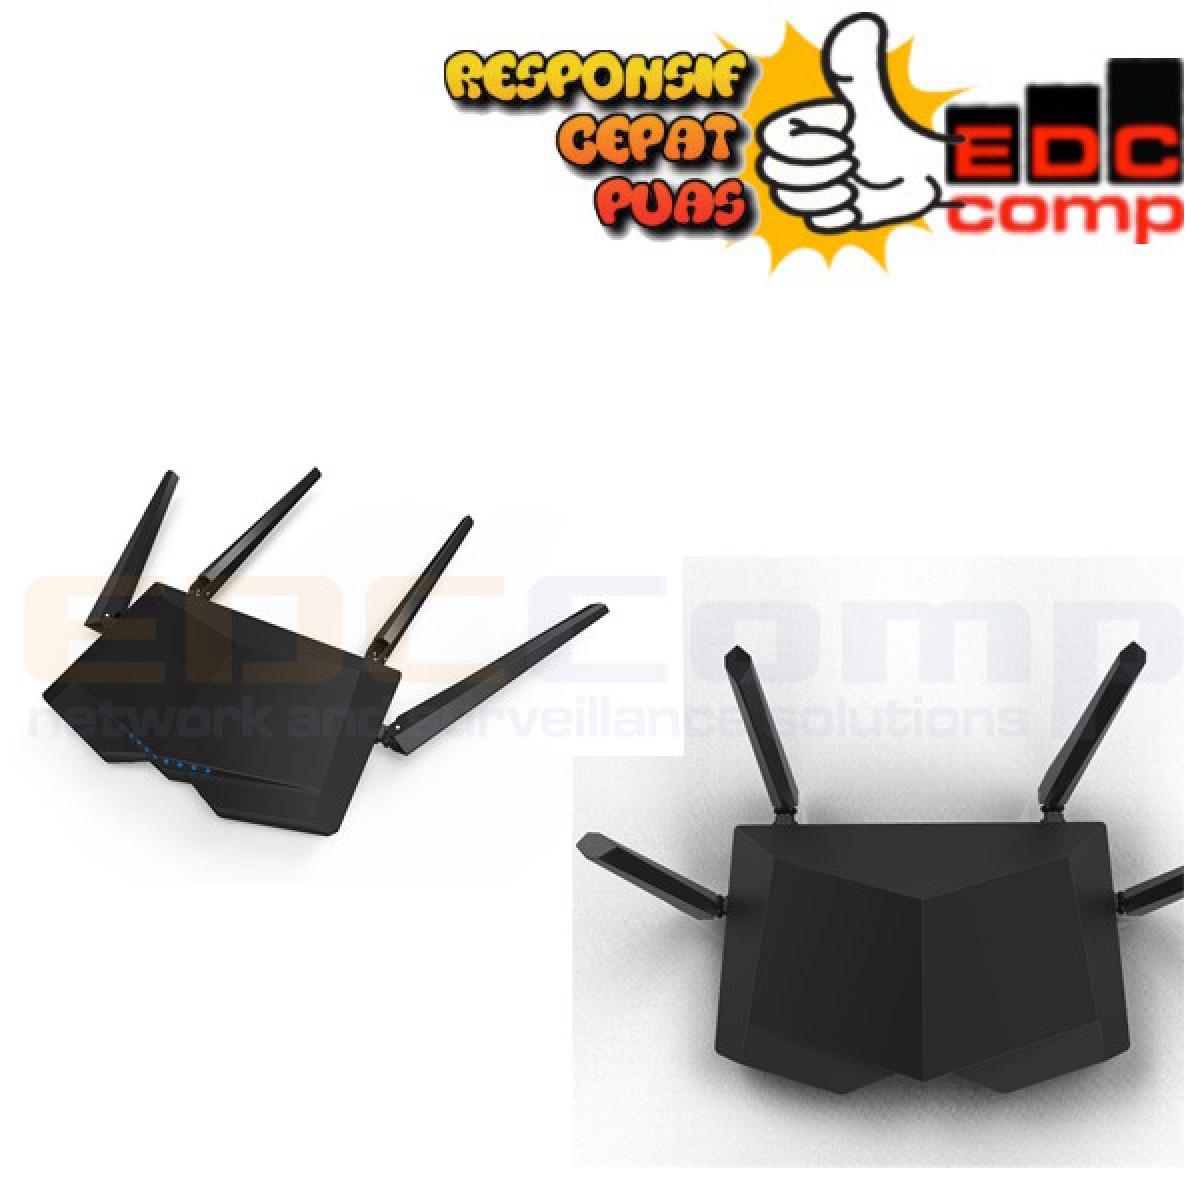 Tenda AC6 Wireless Router - EdcComp